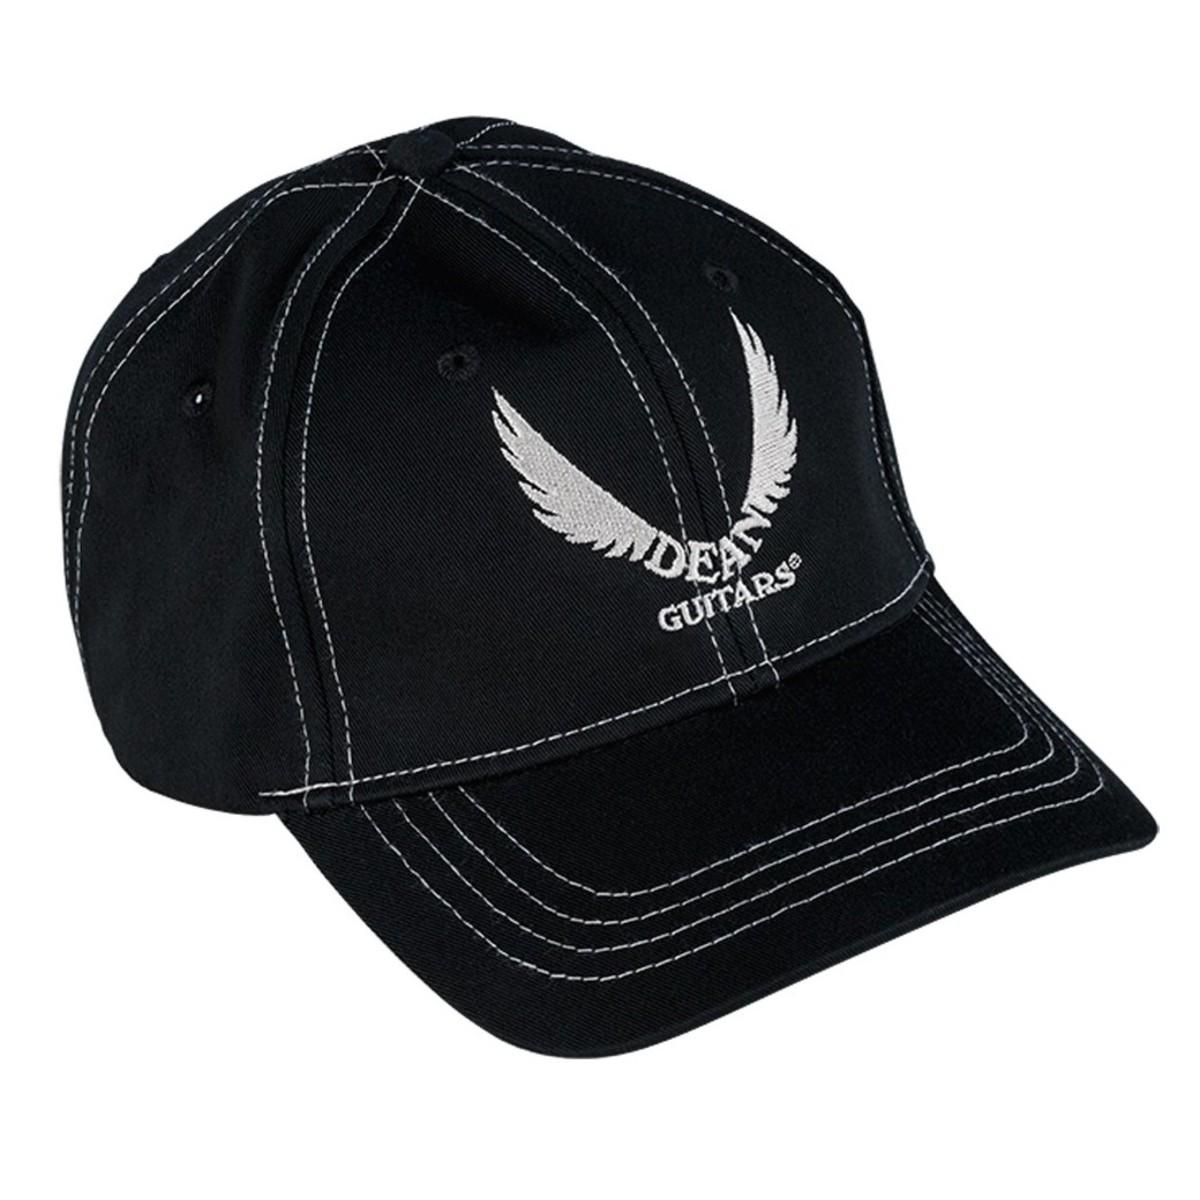 dean guitars baseball cap black wing logo at gear4music